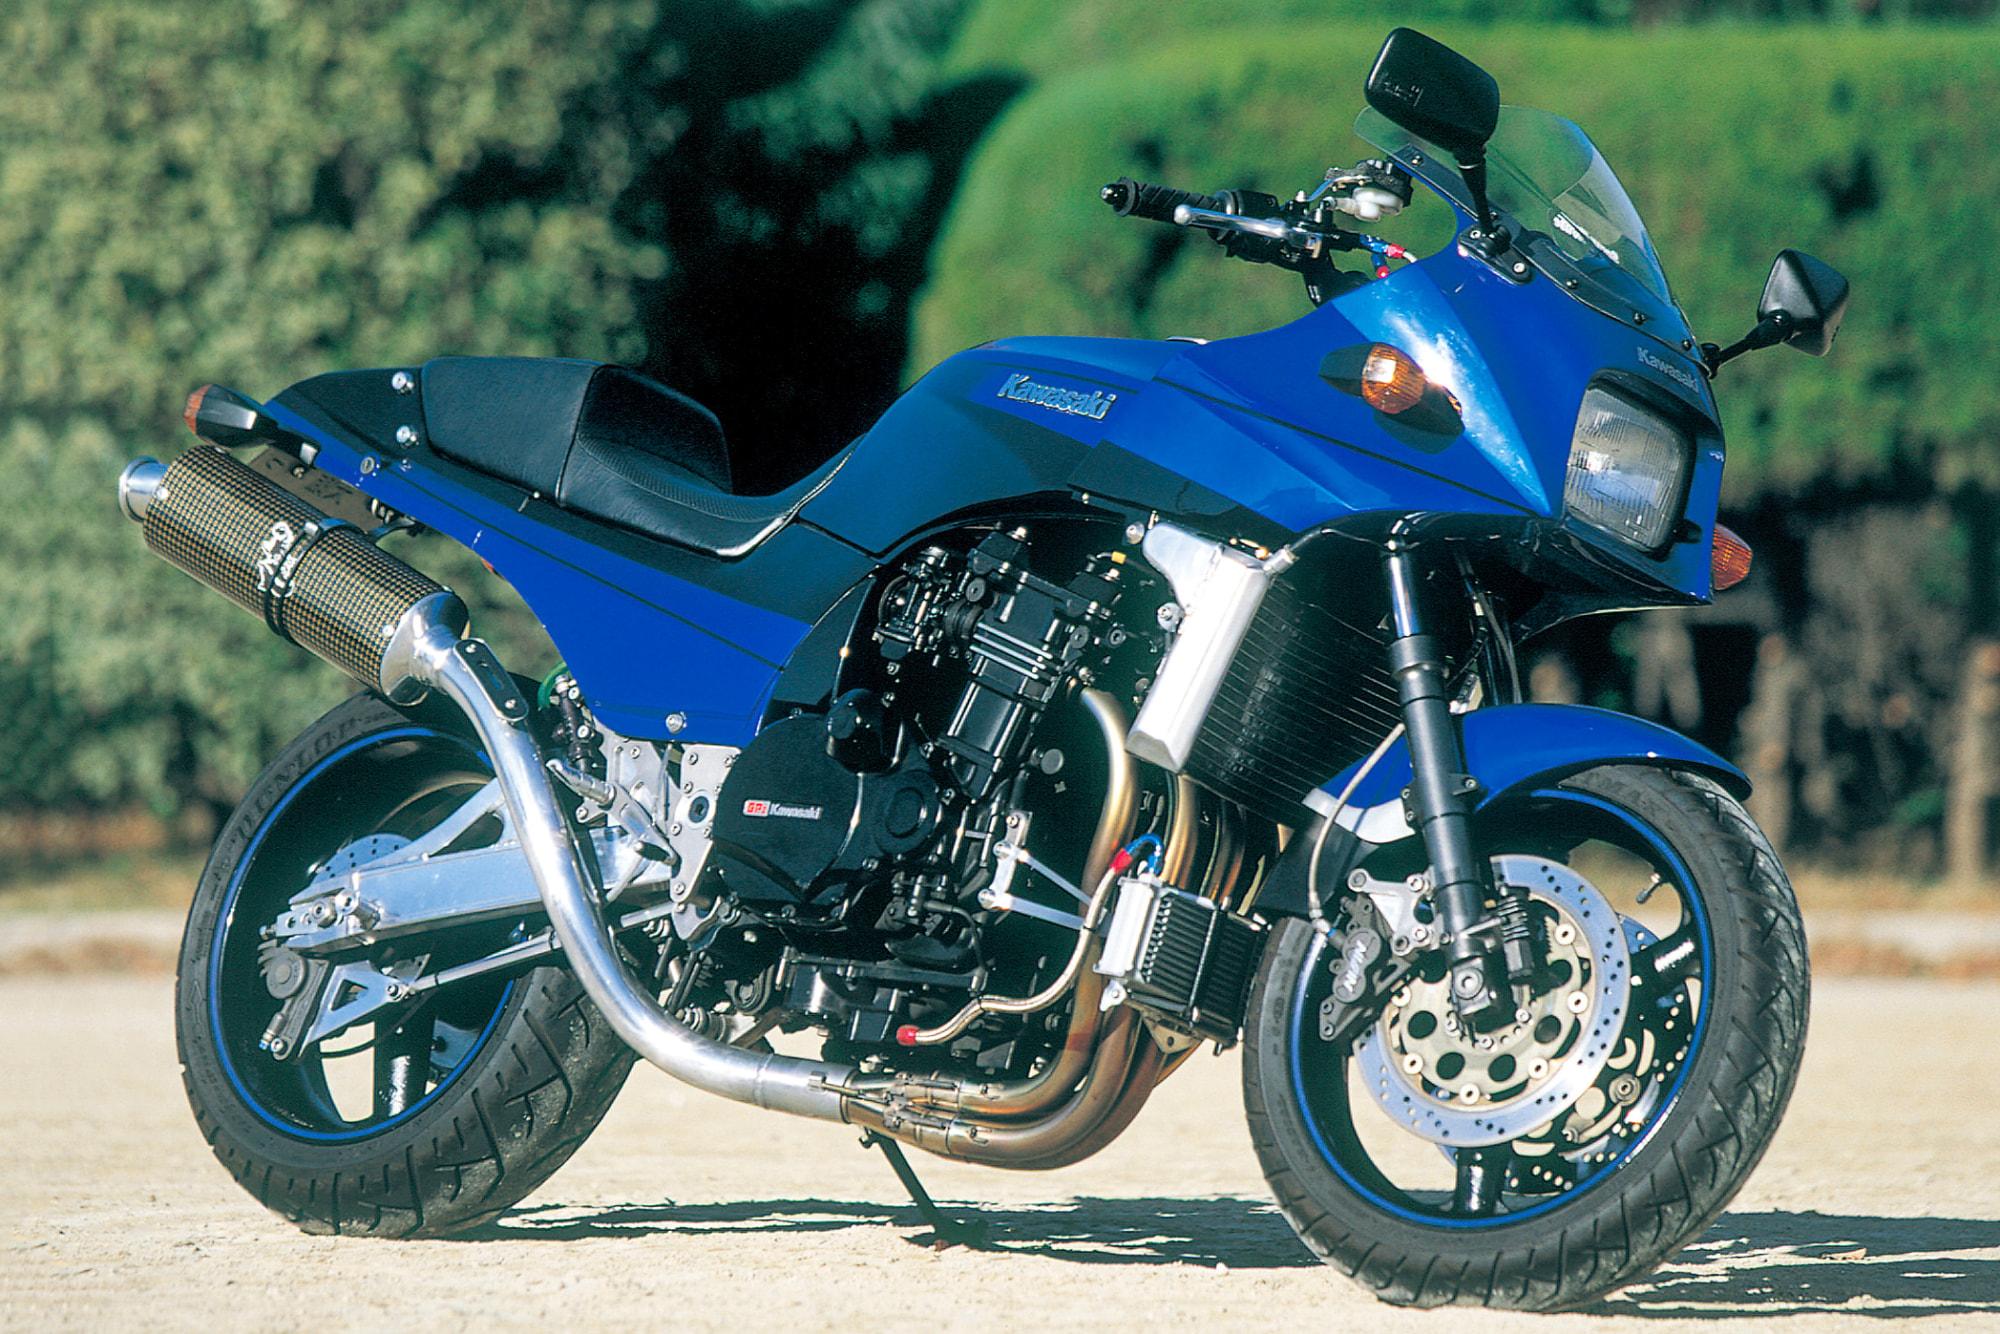 GPZ900R by タバックスエンジニアリング